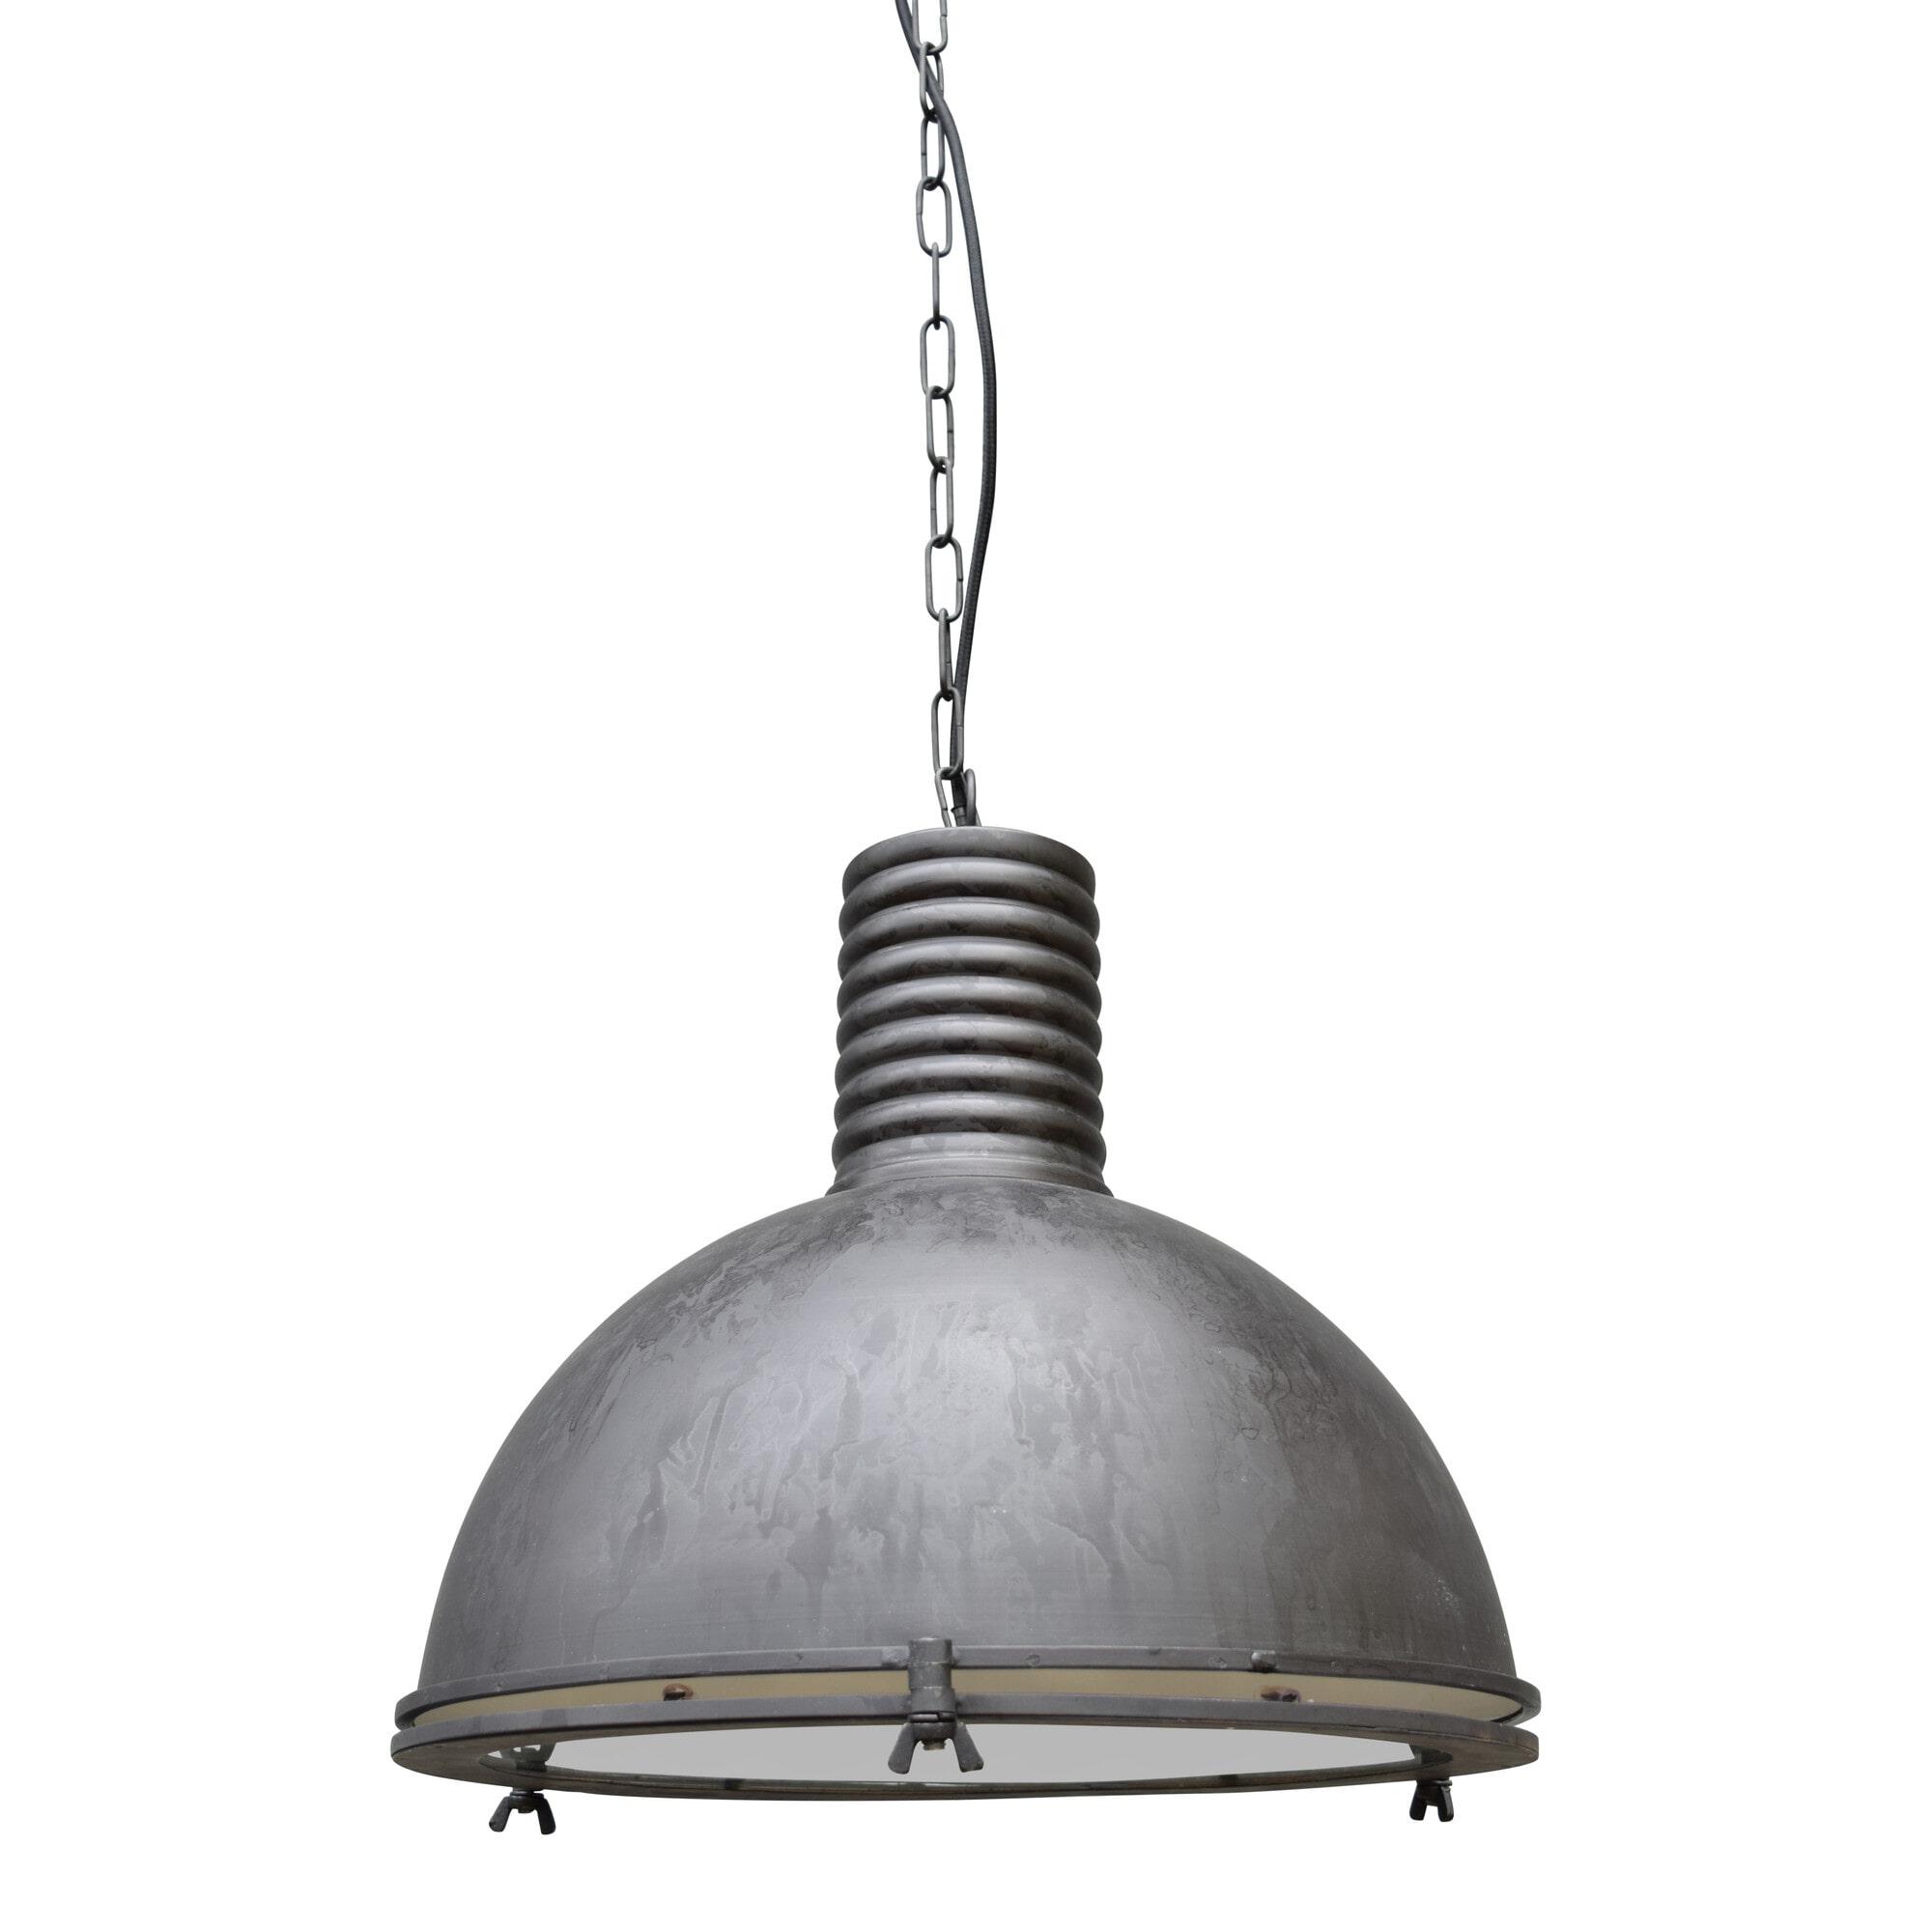 Urban Interiors hanglamp 'Vintage' Ø40cm, kleur Rough Black